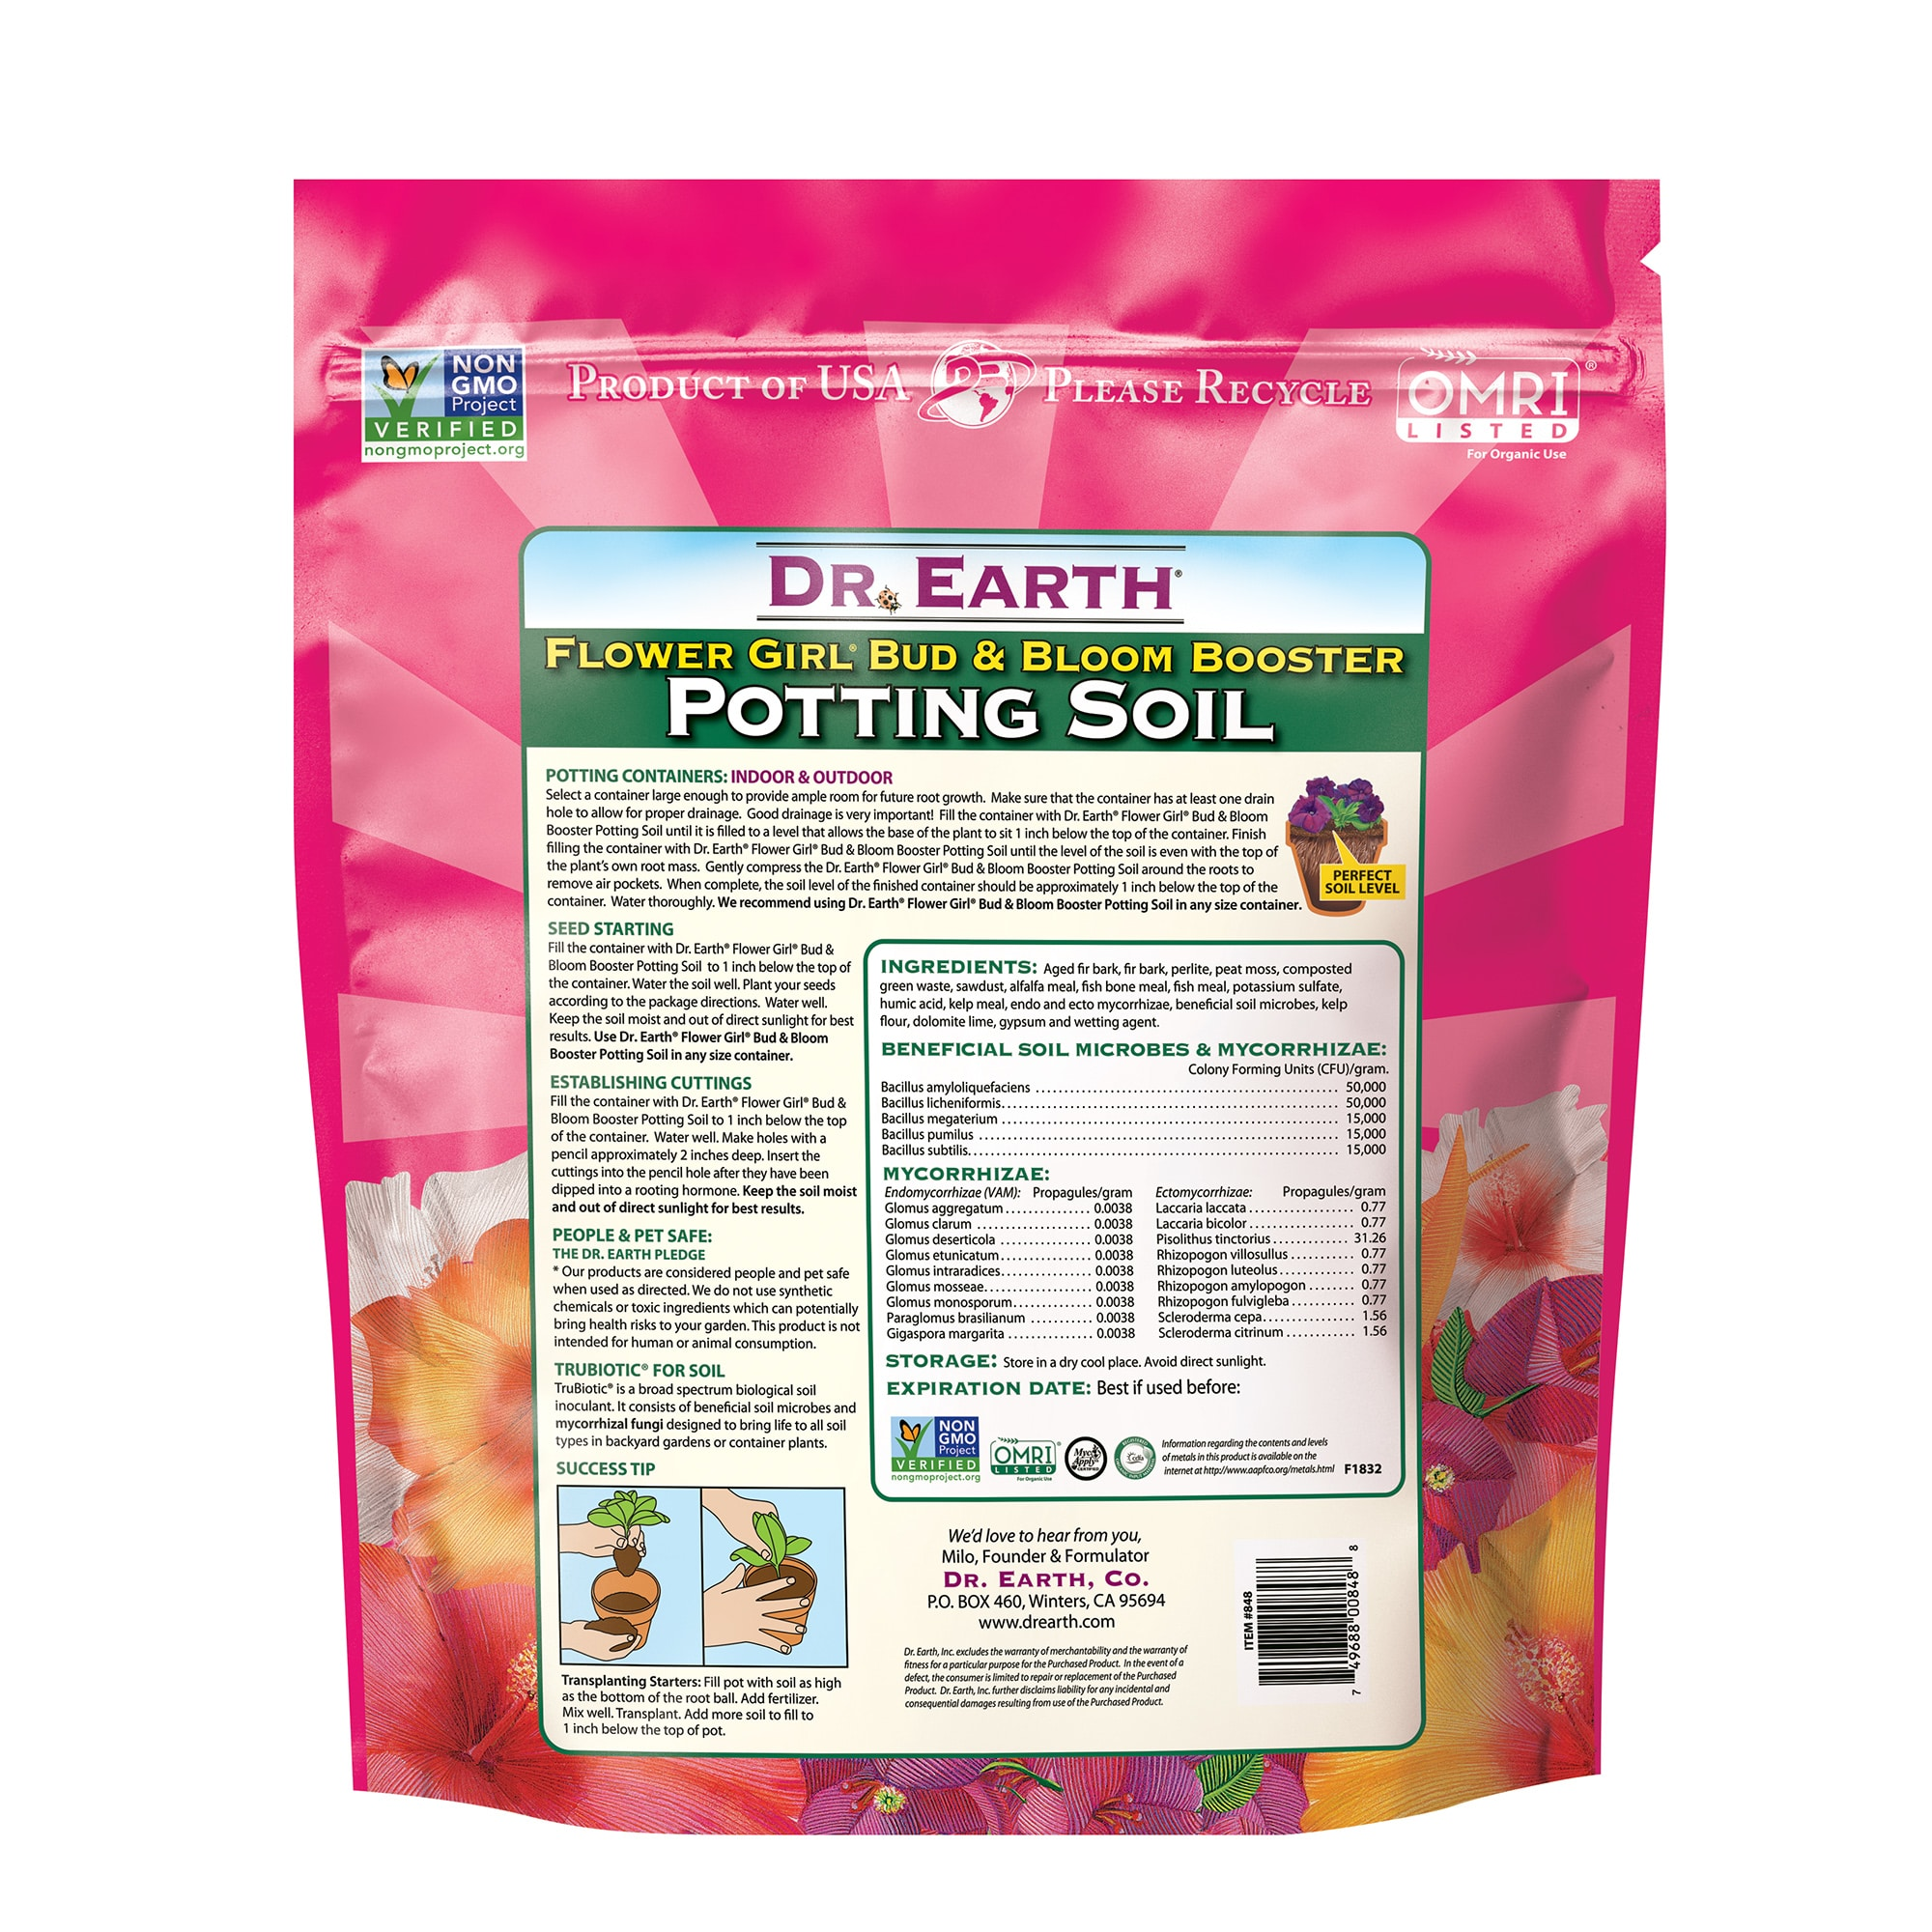 Flower Girl Bud & Bloom Booster Potting Soil Back information